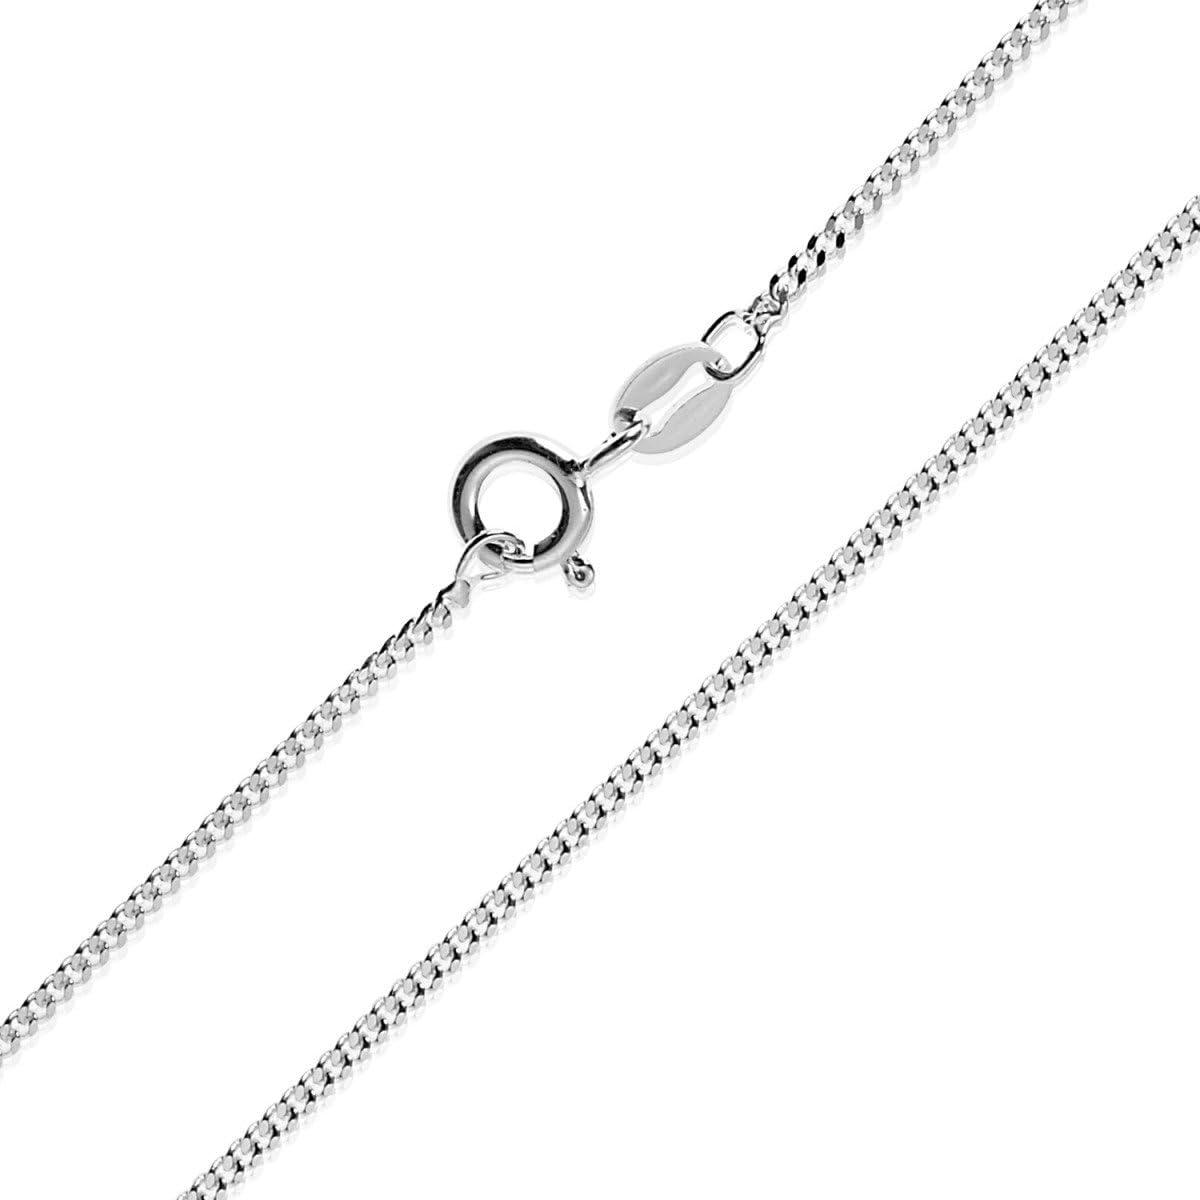 Collier Bracelet Chaîne Cheville argent massif 925 sterling maille serpent 1mm